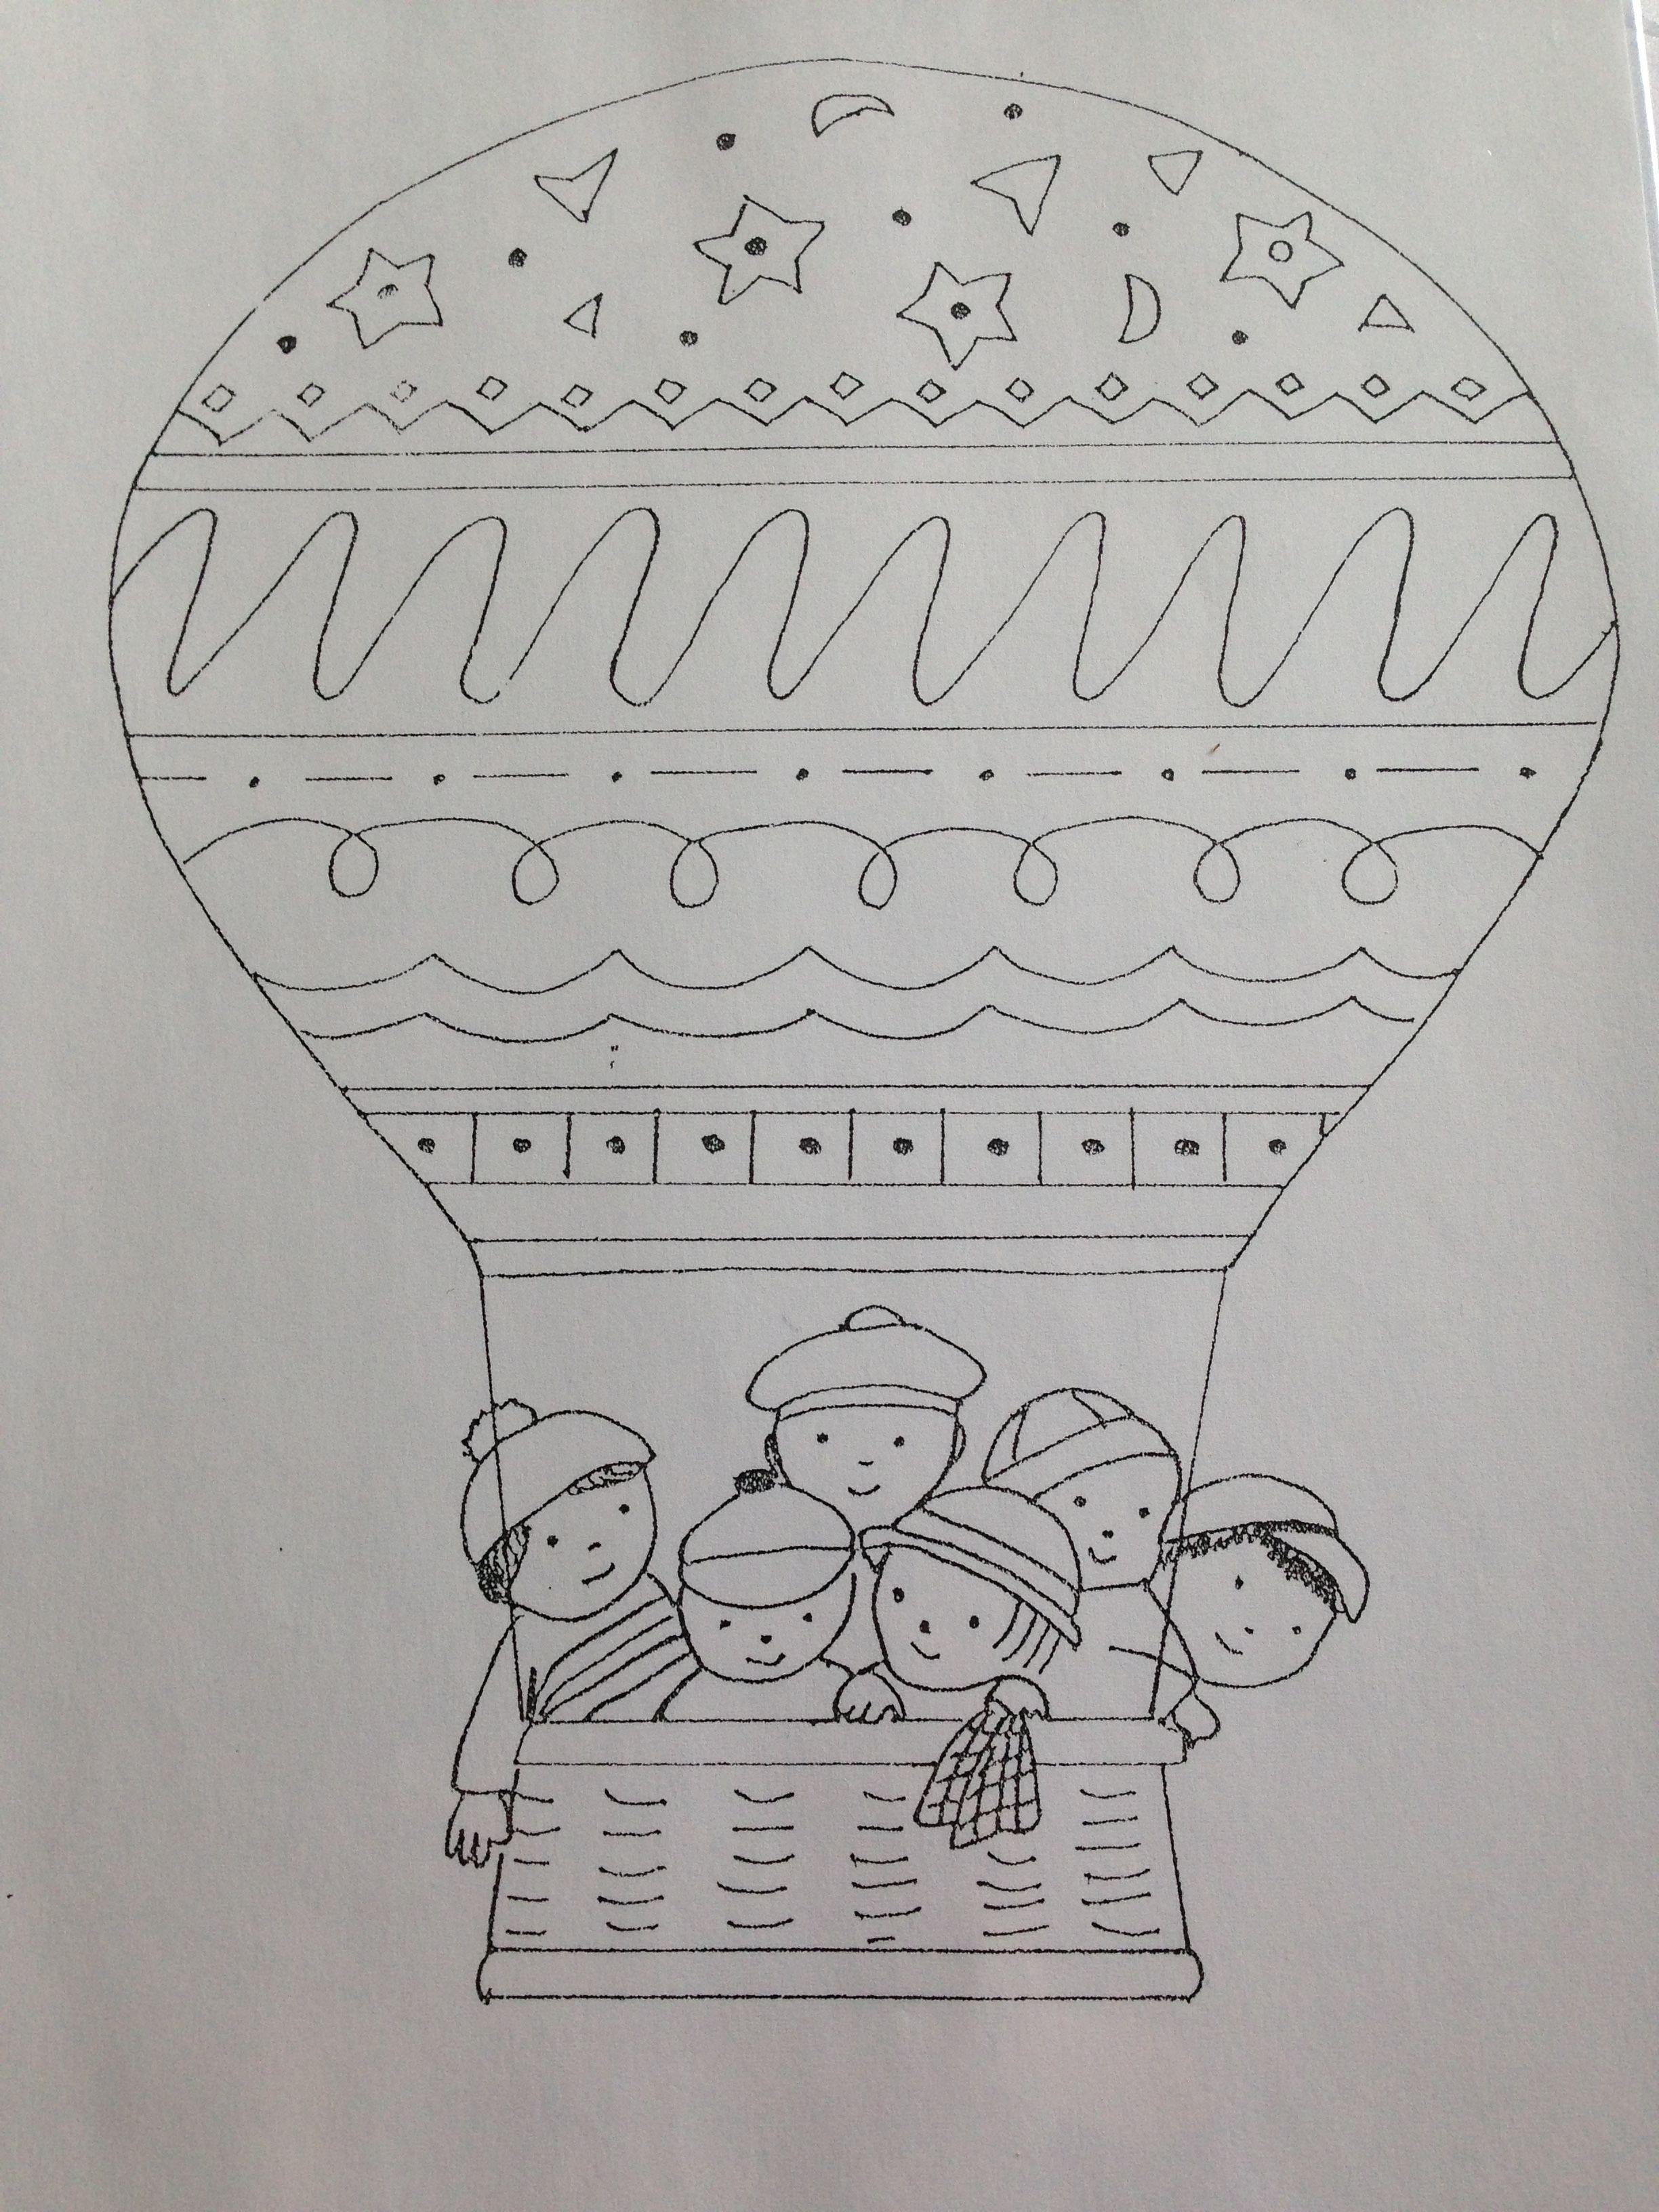 Luchtballon Kleurplaat Schrijfpatronen Welkom Thuis Schrijfhoek Luchtballon